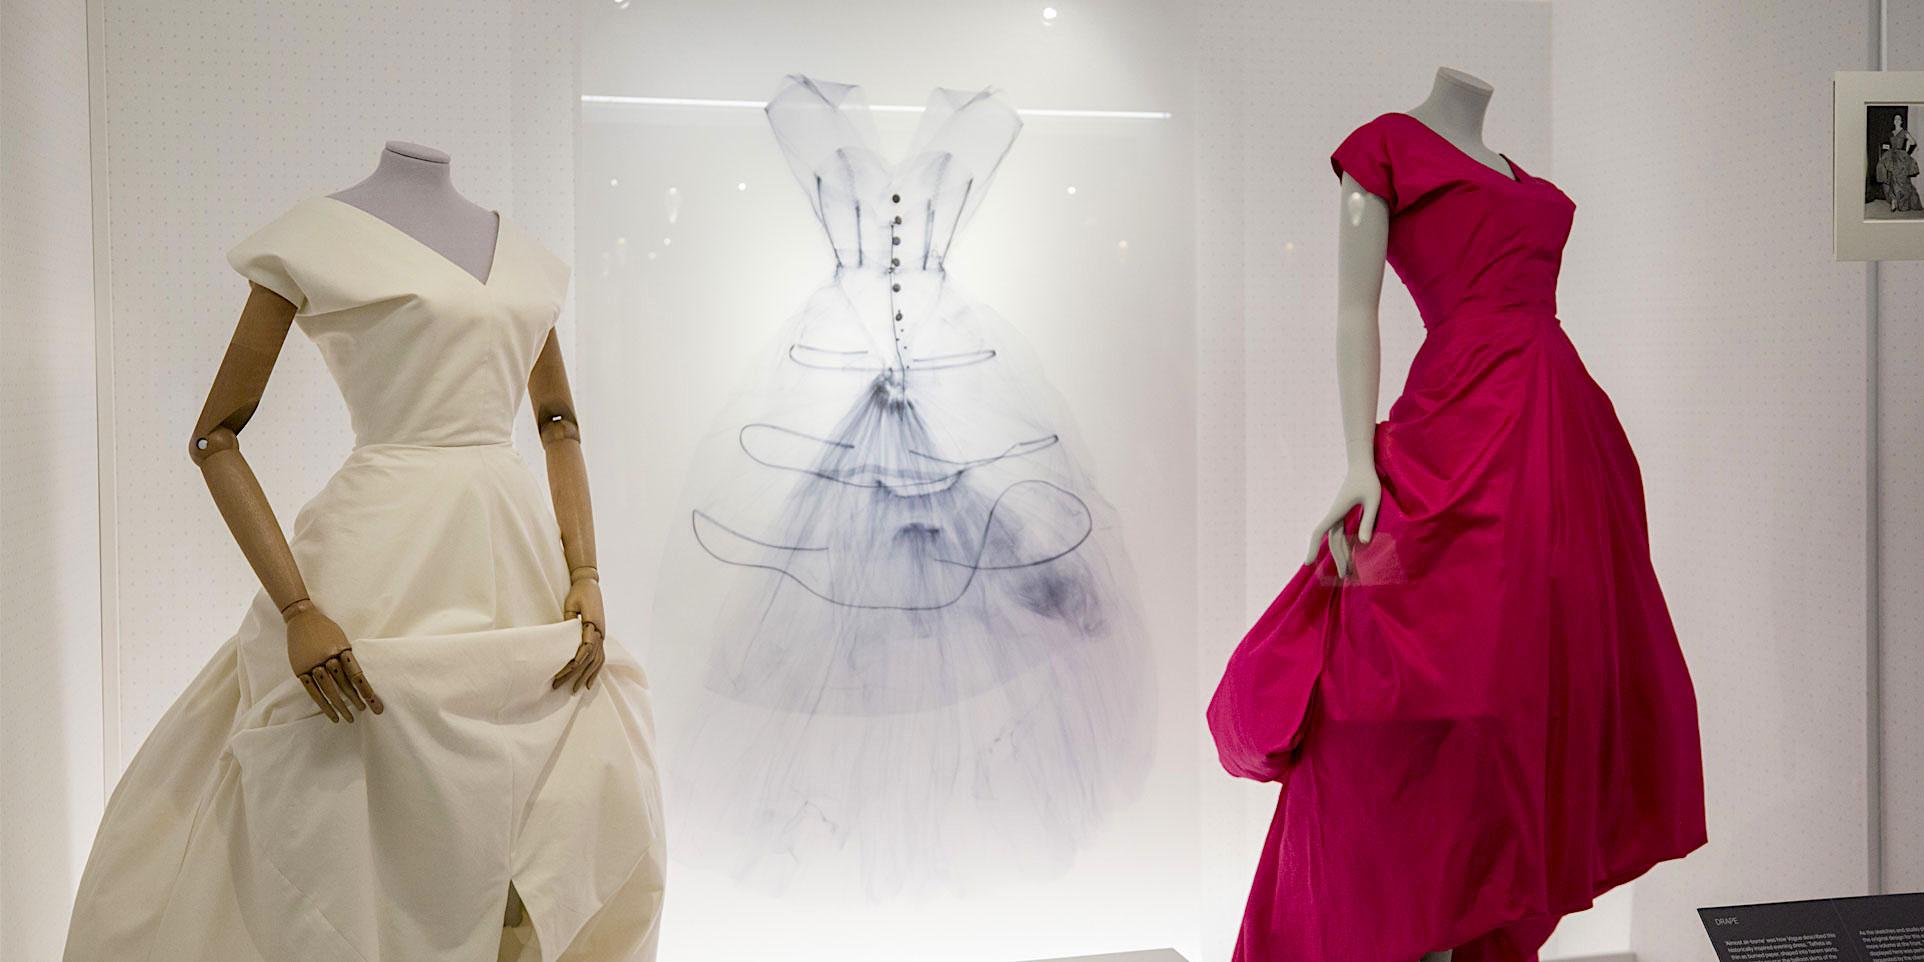 Balenciaga-Shaping-Fashion-Exhibition-View_1.jpg